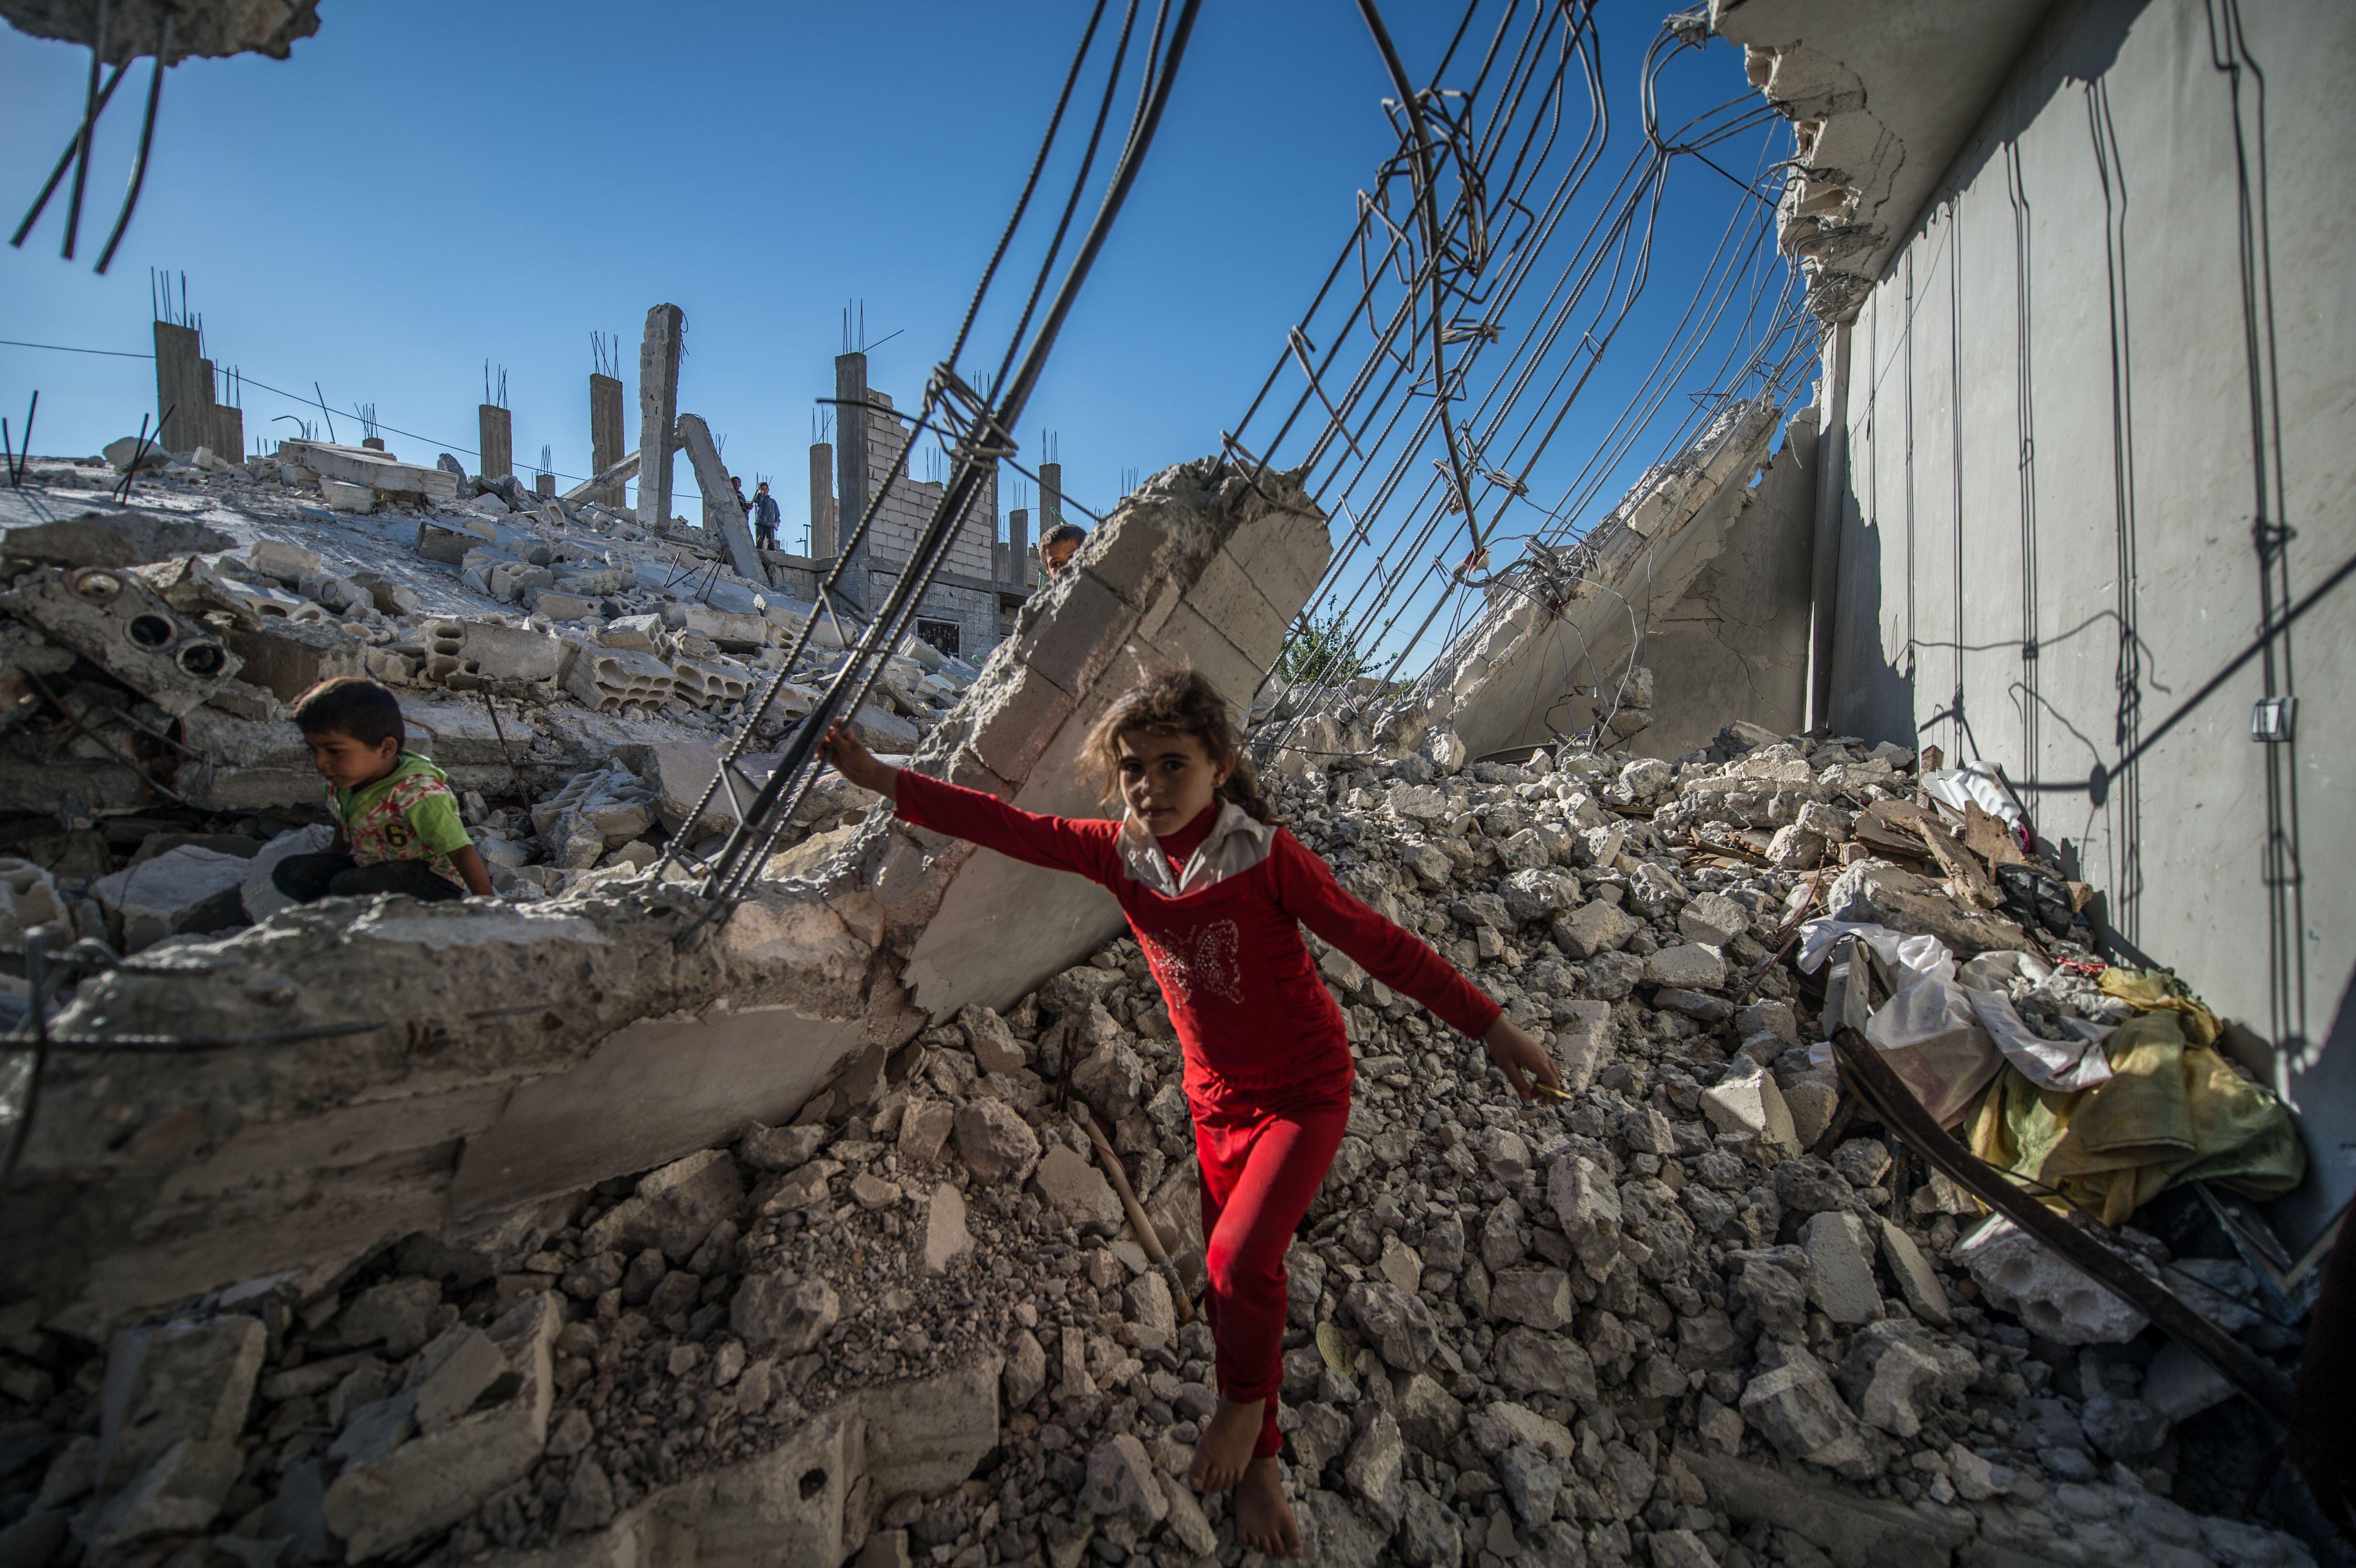 Russian Jets Strike Aleppo As U.S. Clings To